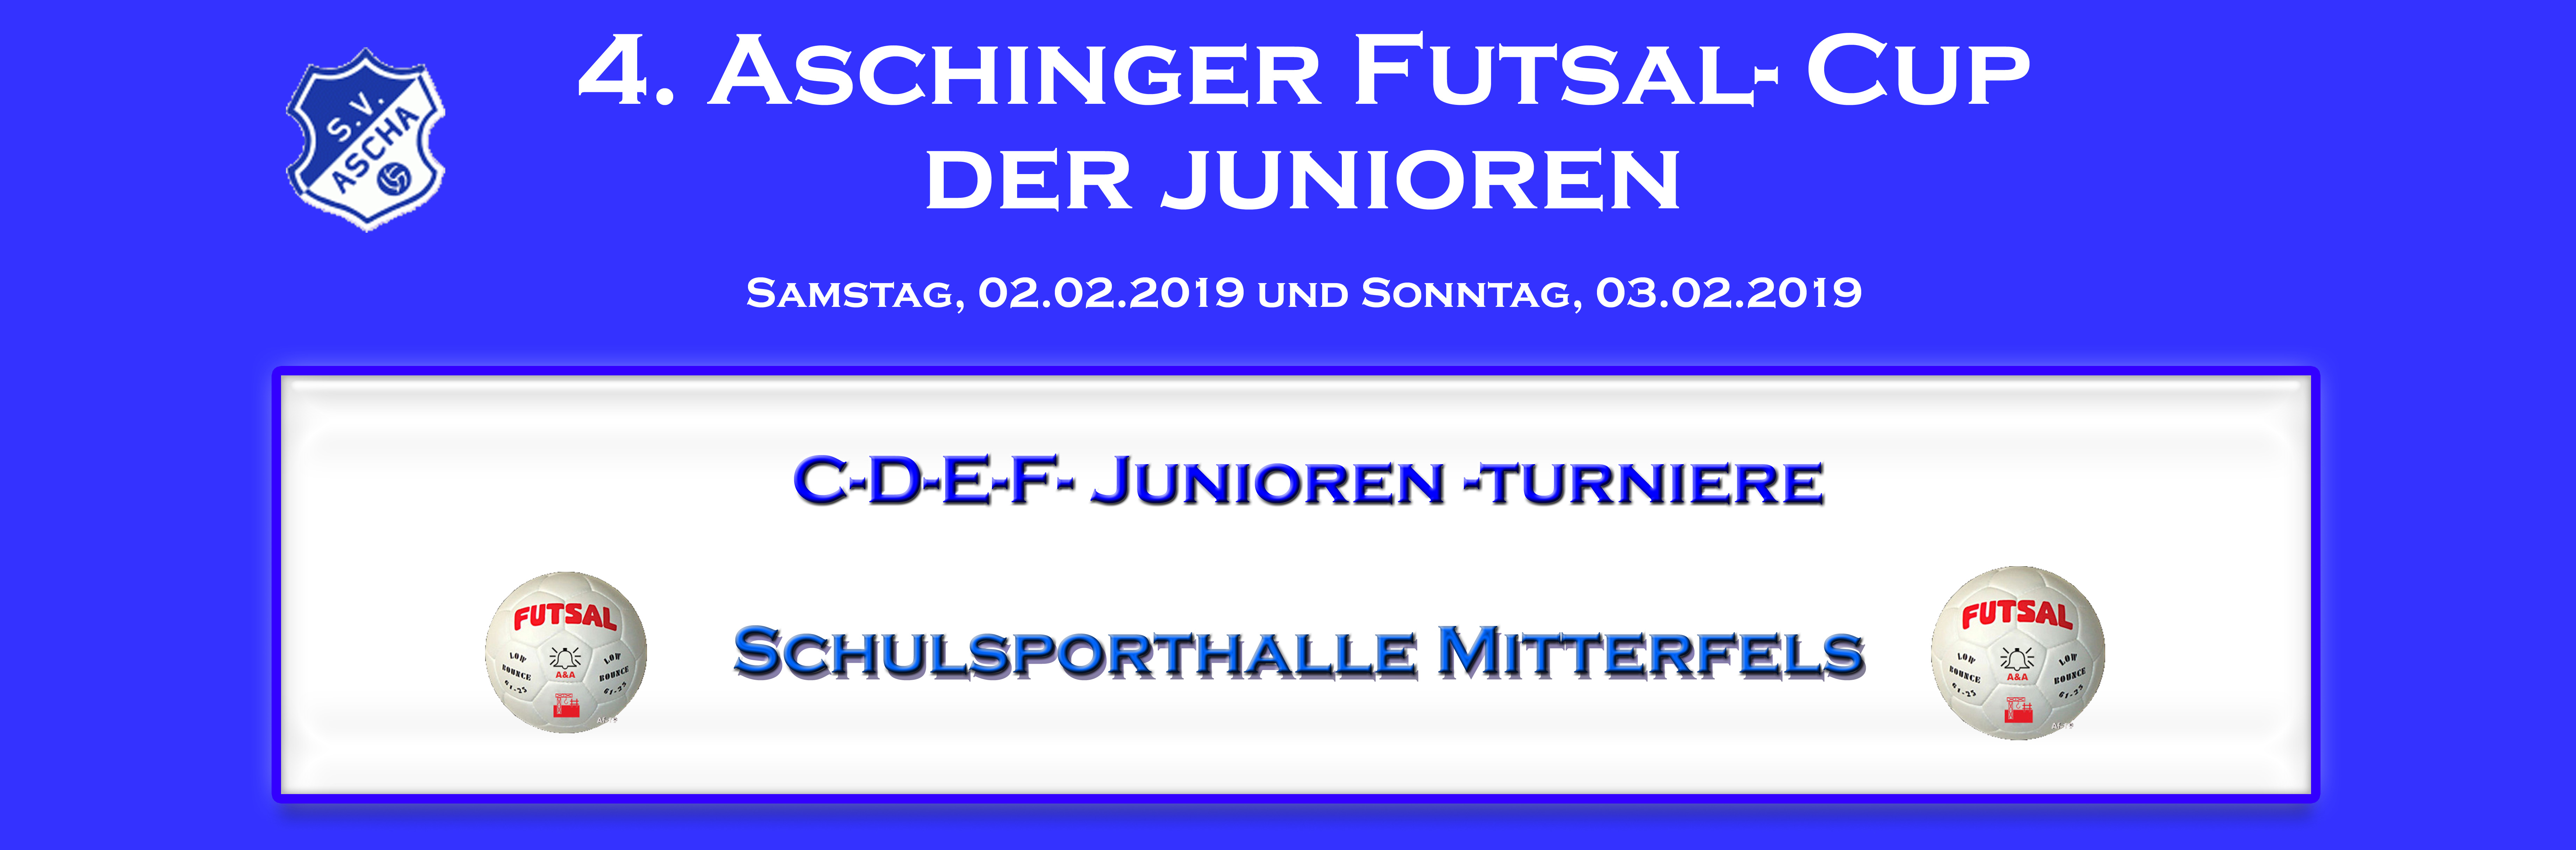 Vorlage Futsal-Cup 2019 Kopie